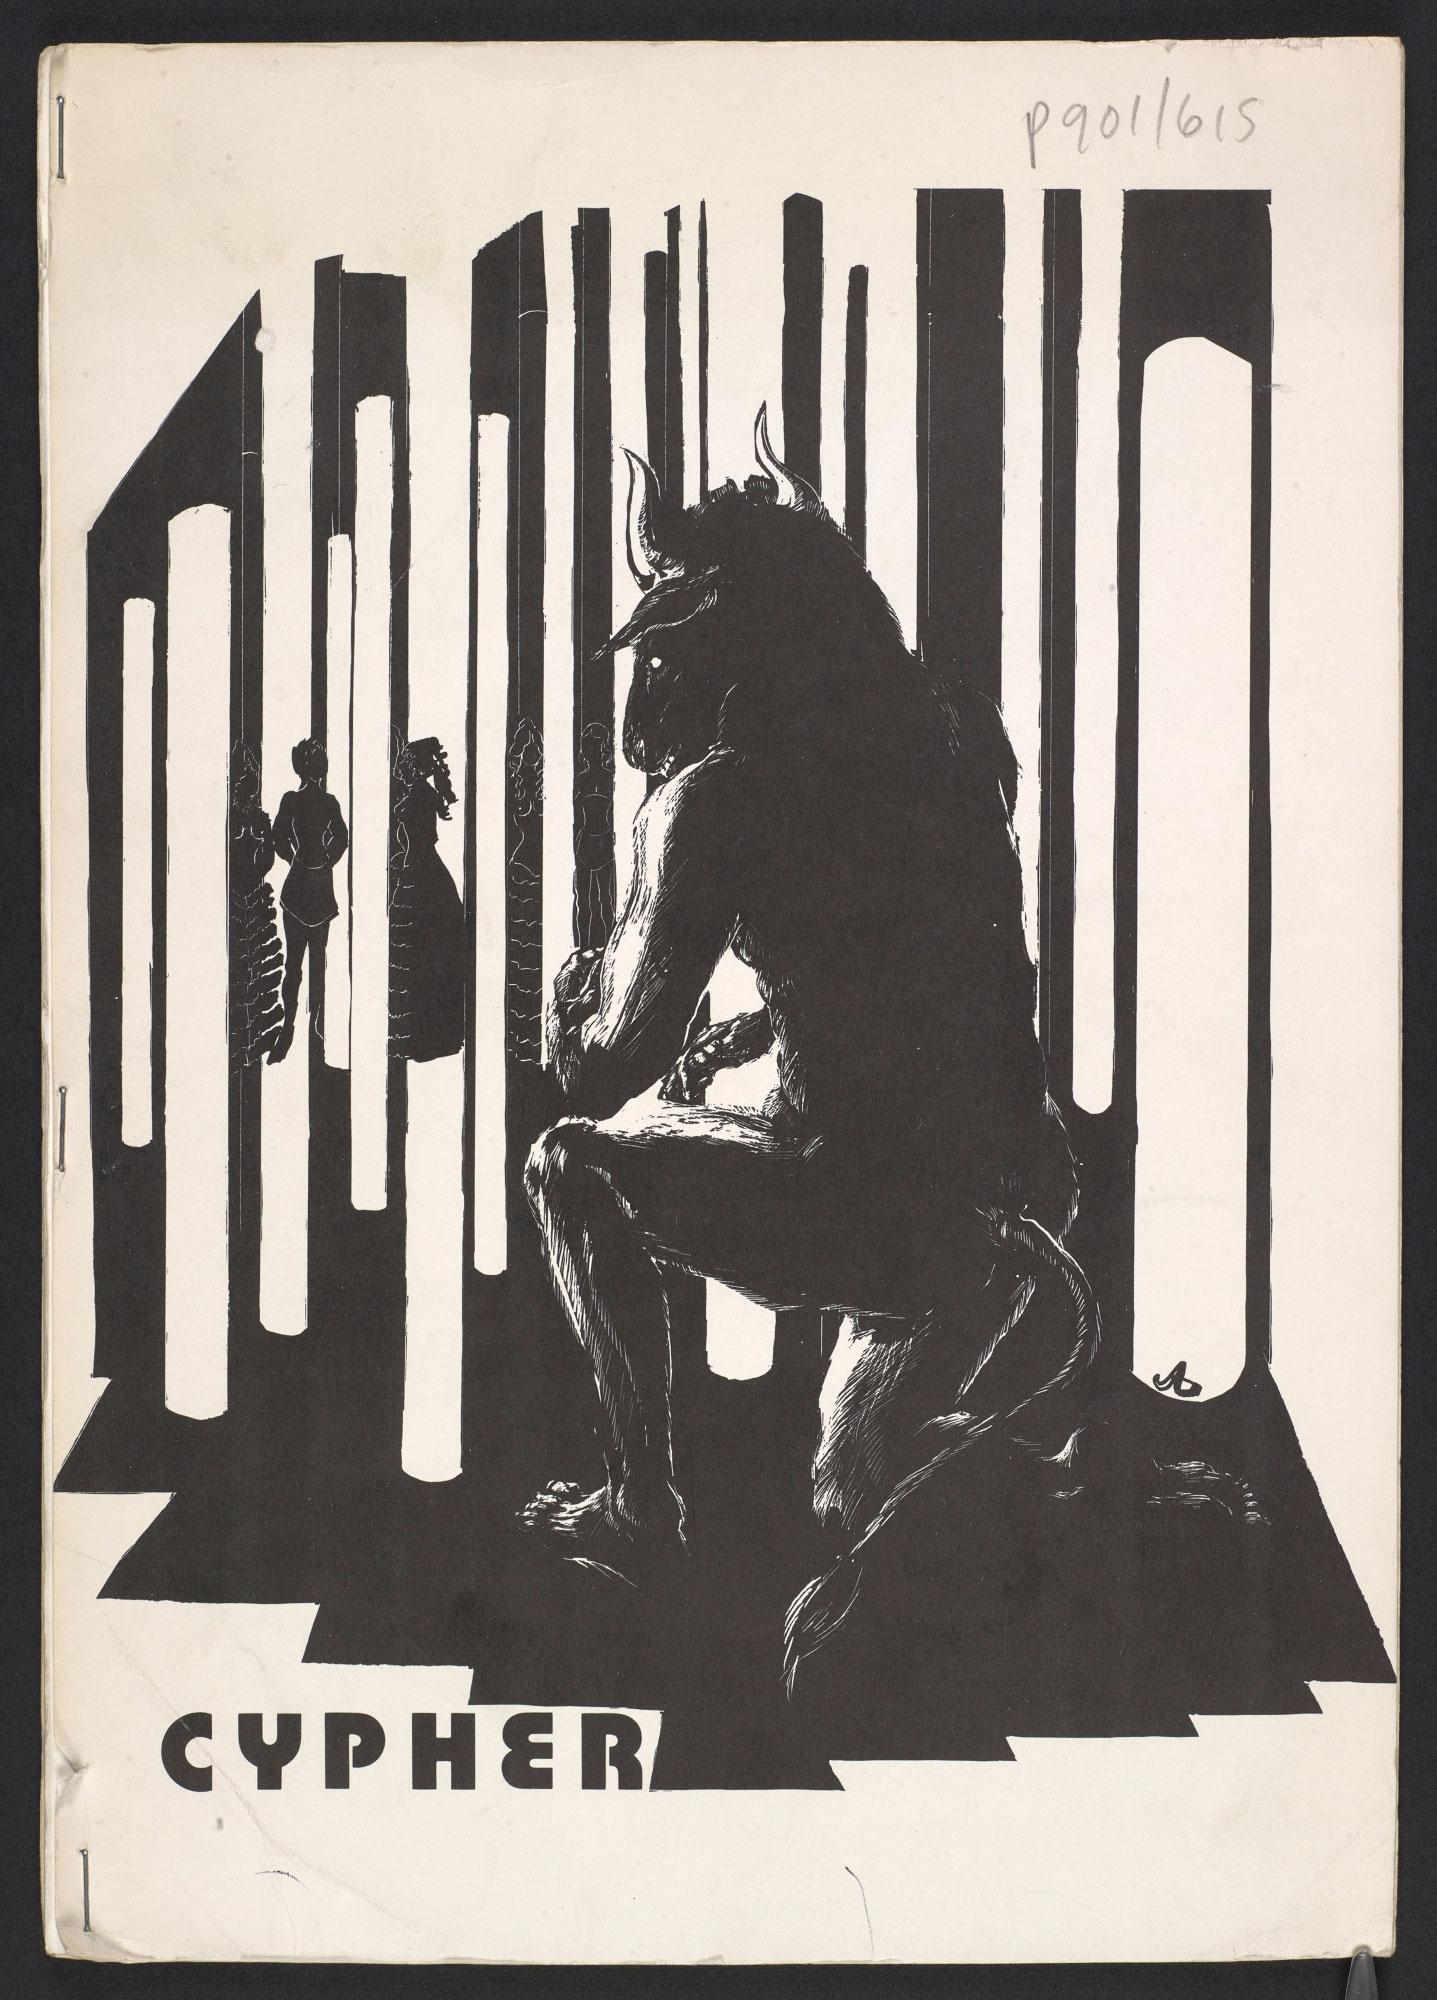 'Ballard on Crash' from Cypher magazine